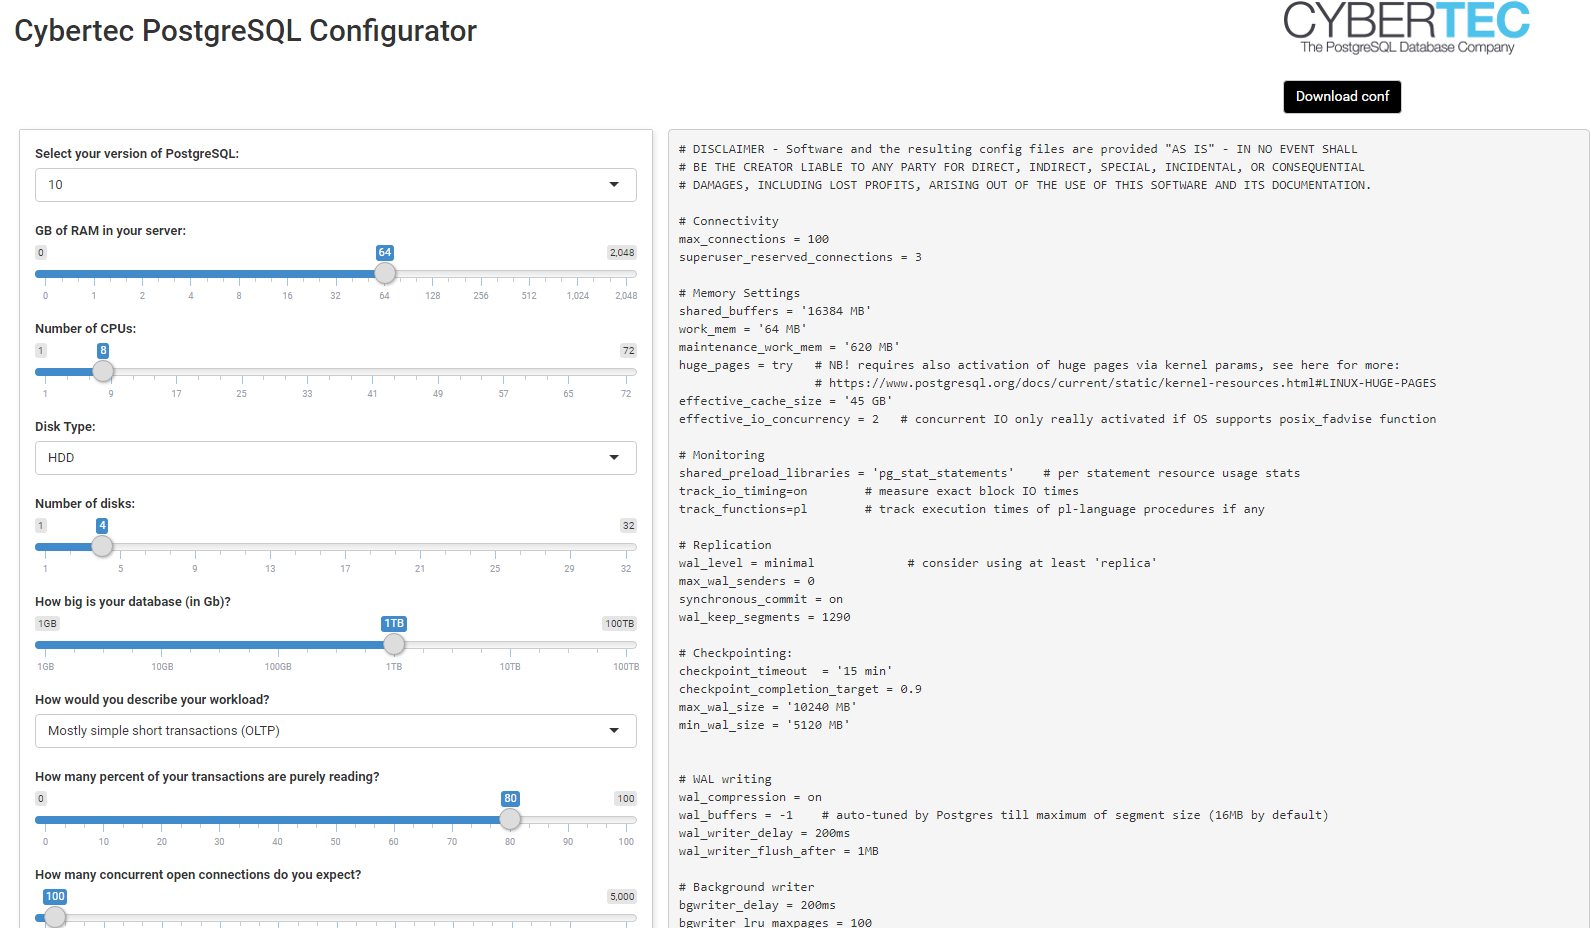 Cybertec PostgreSQL Configurator